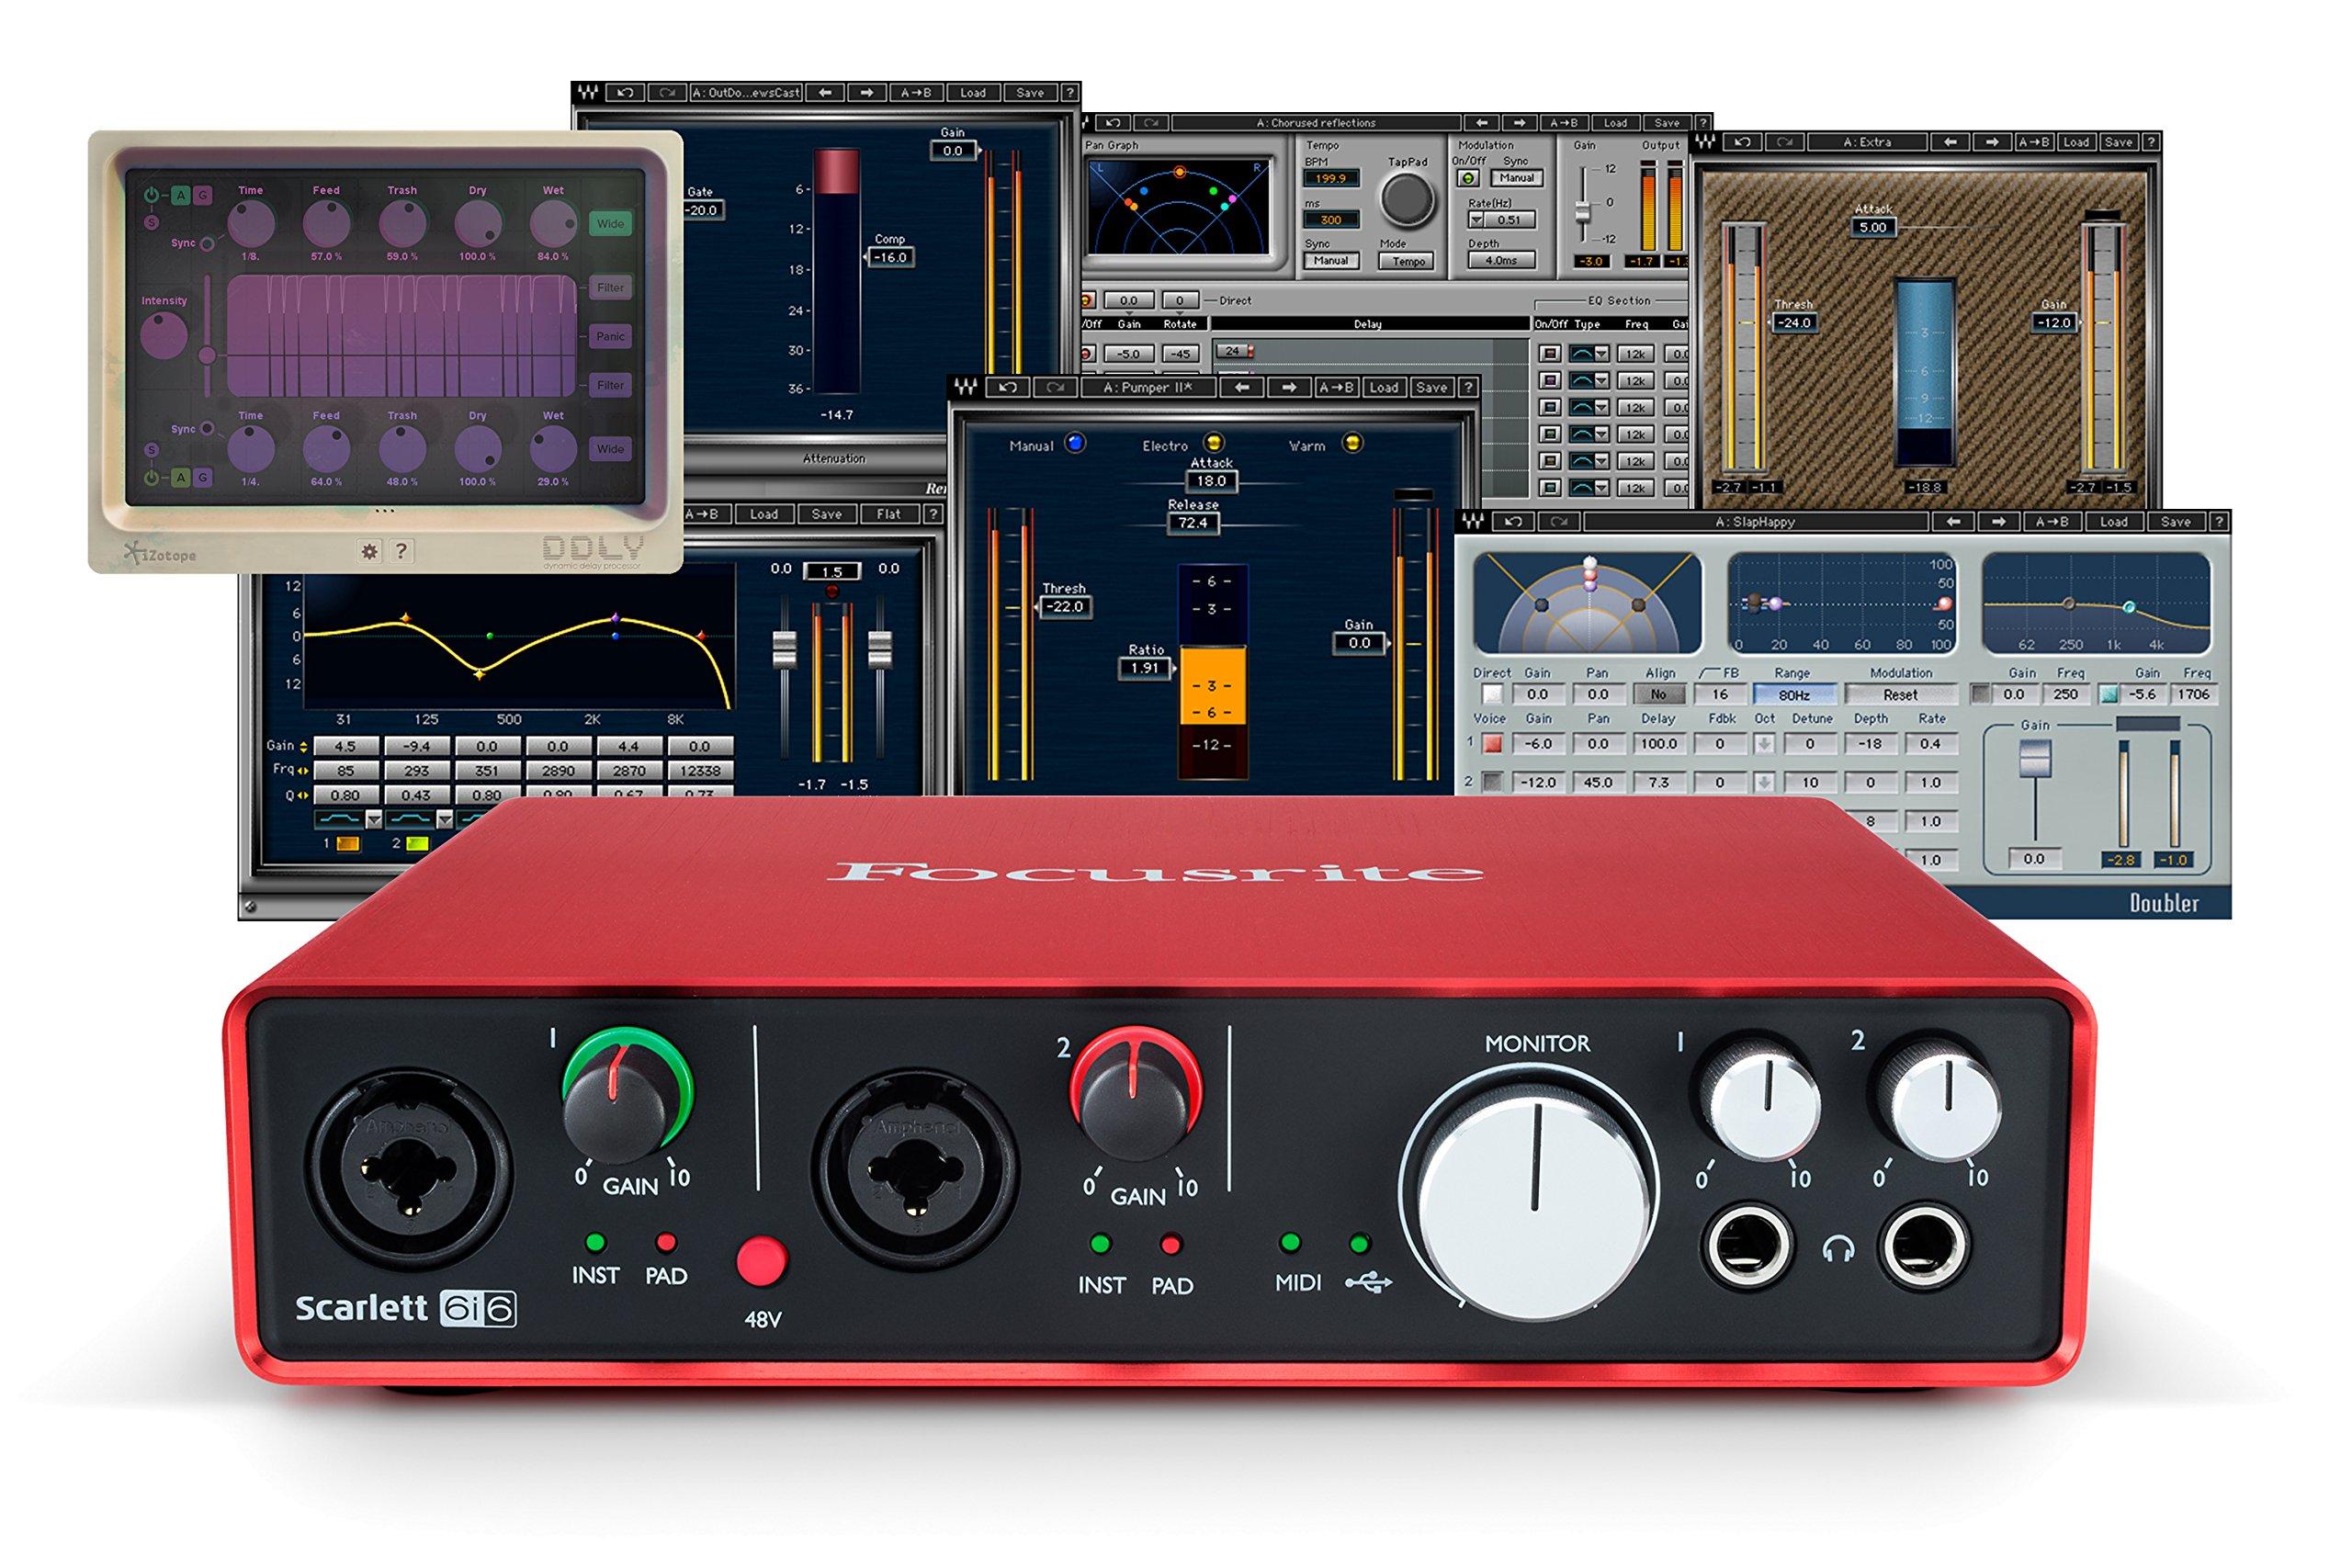 Focusrite Scarlett 6i6 (2nd Gen) USB Audio Interface + Waves Musicians 2 + iZotope DDLY Dynamic Delay